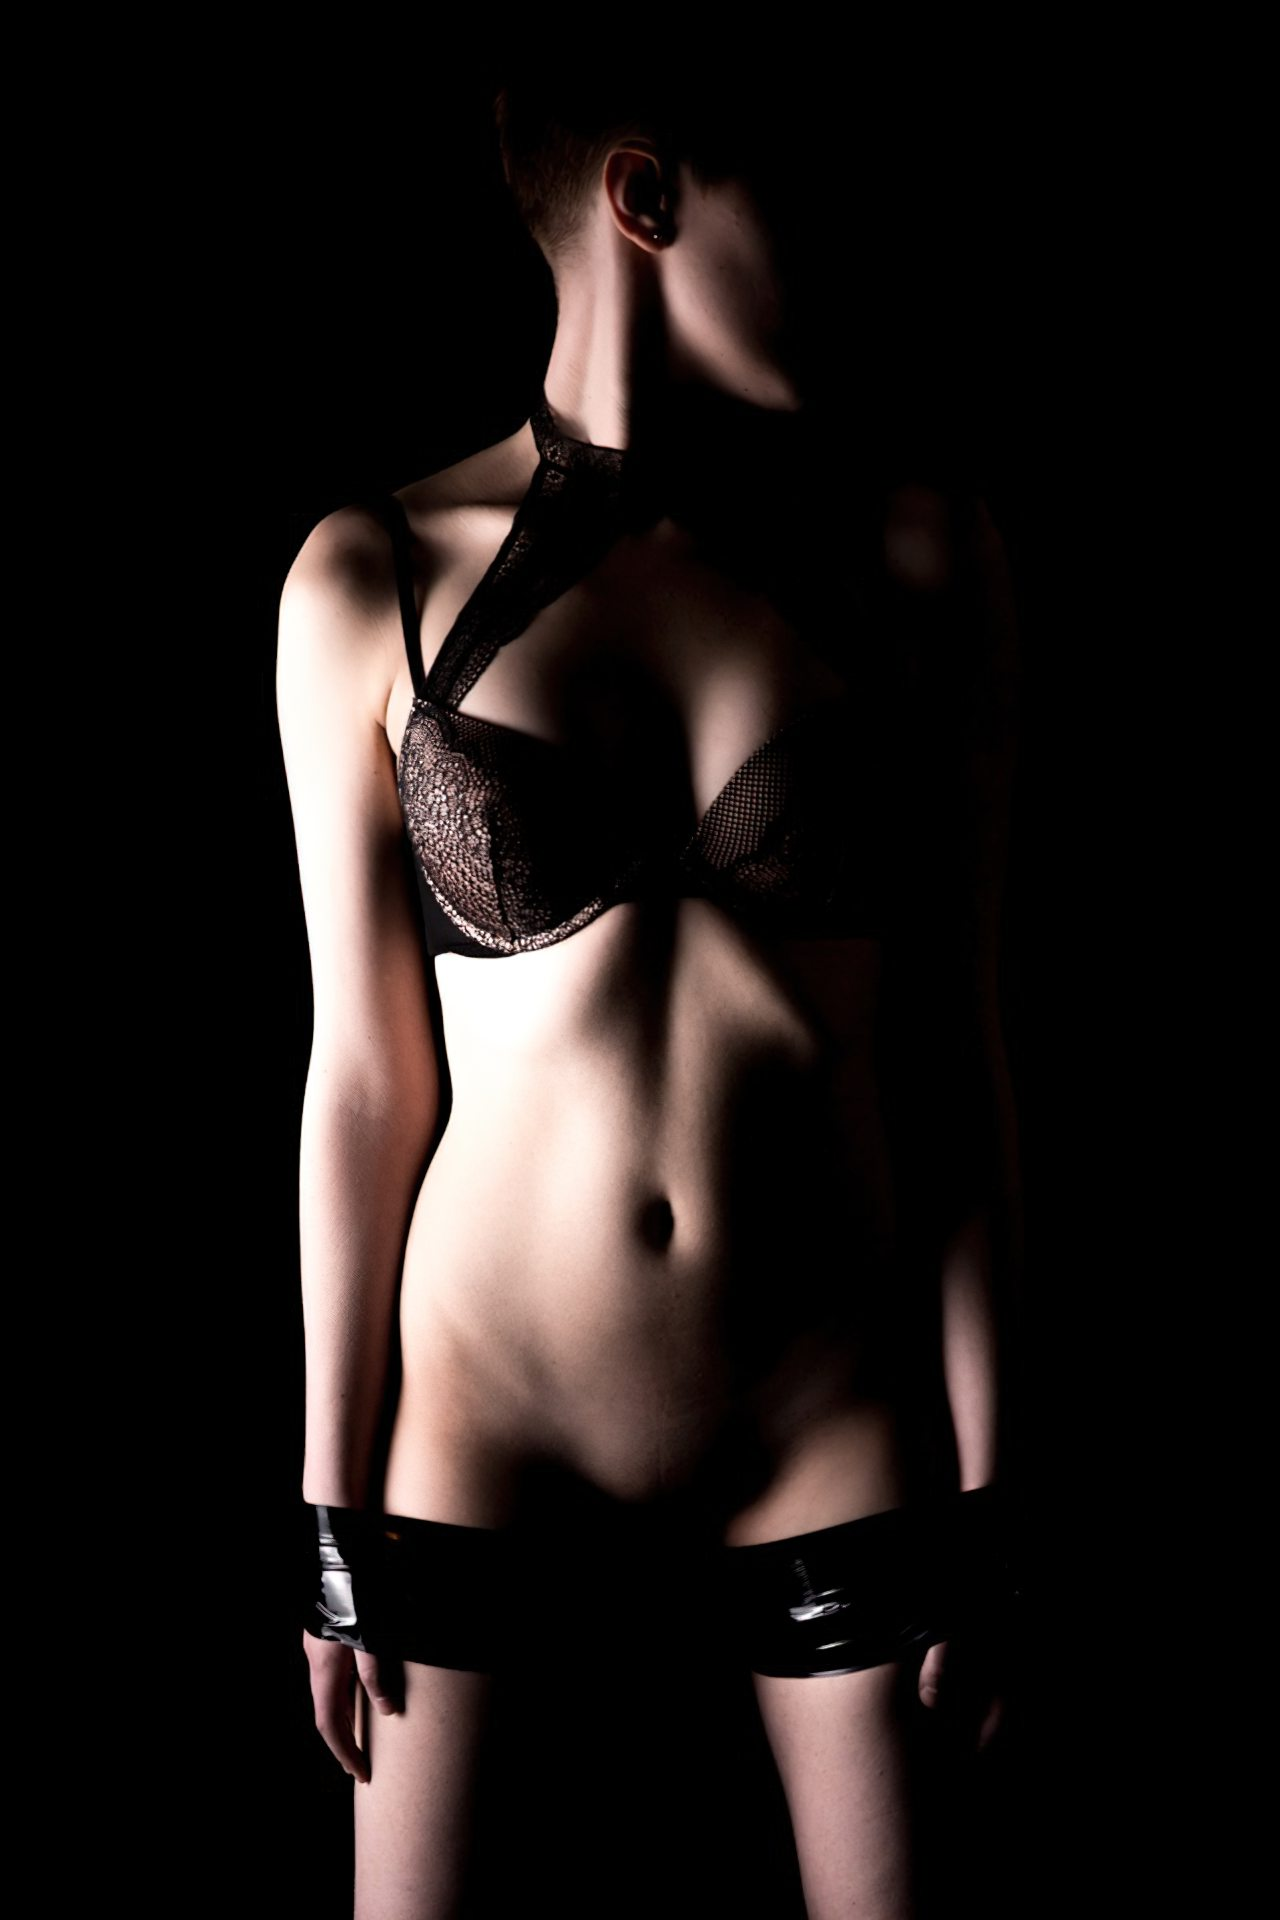 Fotos Mulher Bisexual (1)